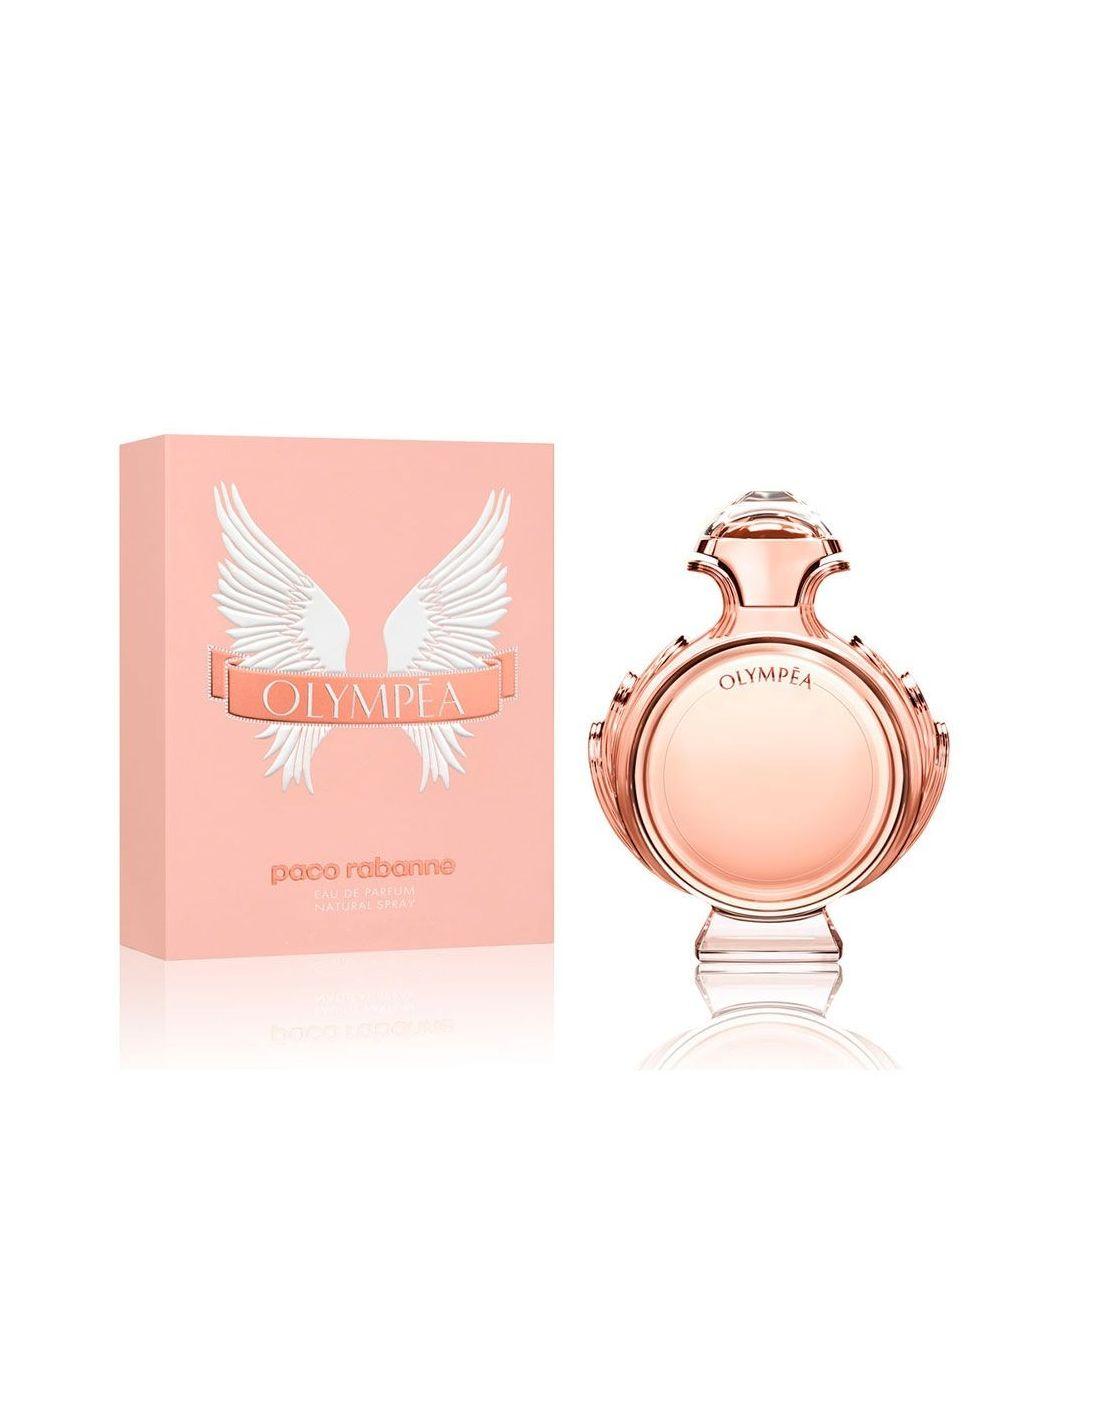 perfume olympea eau de parfum 30 ml perfumes 24. Black Bedroom Furniture Sets. Home Design Ideas